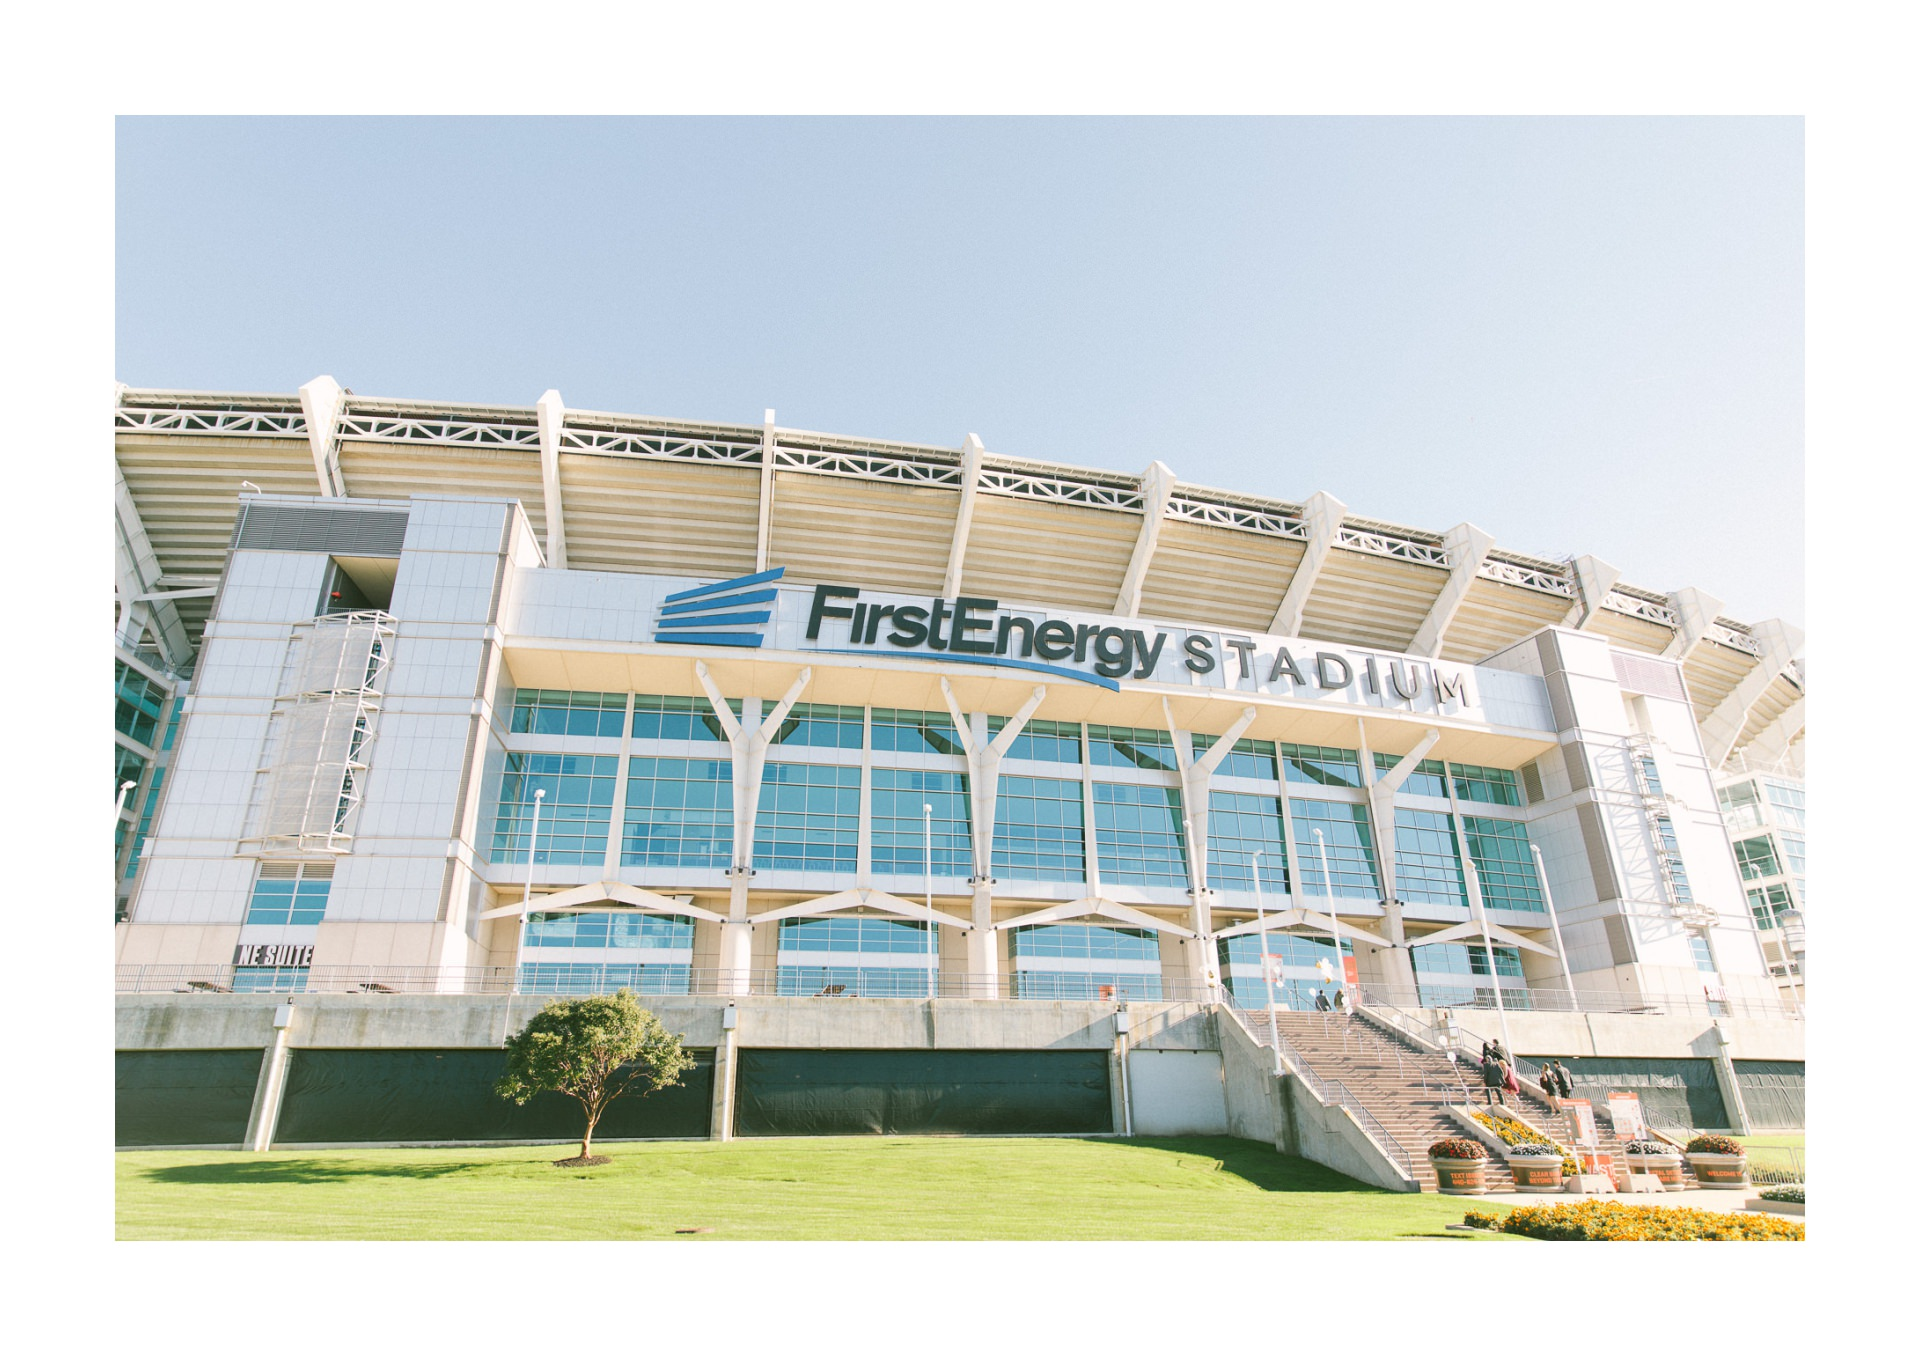 Browns First Energy Stadium Draft Room Wedding Photos 2 23.jpg